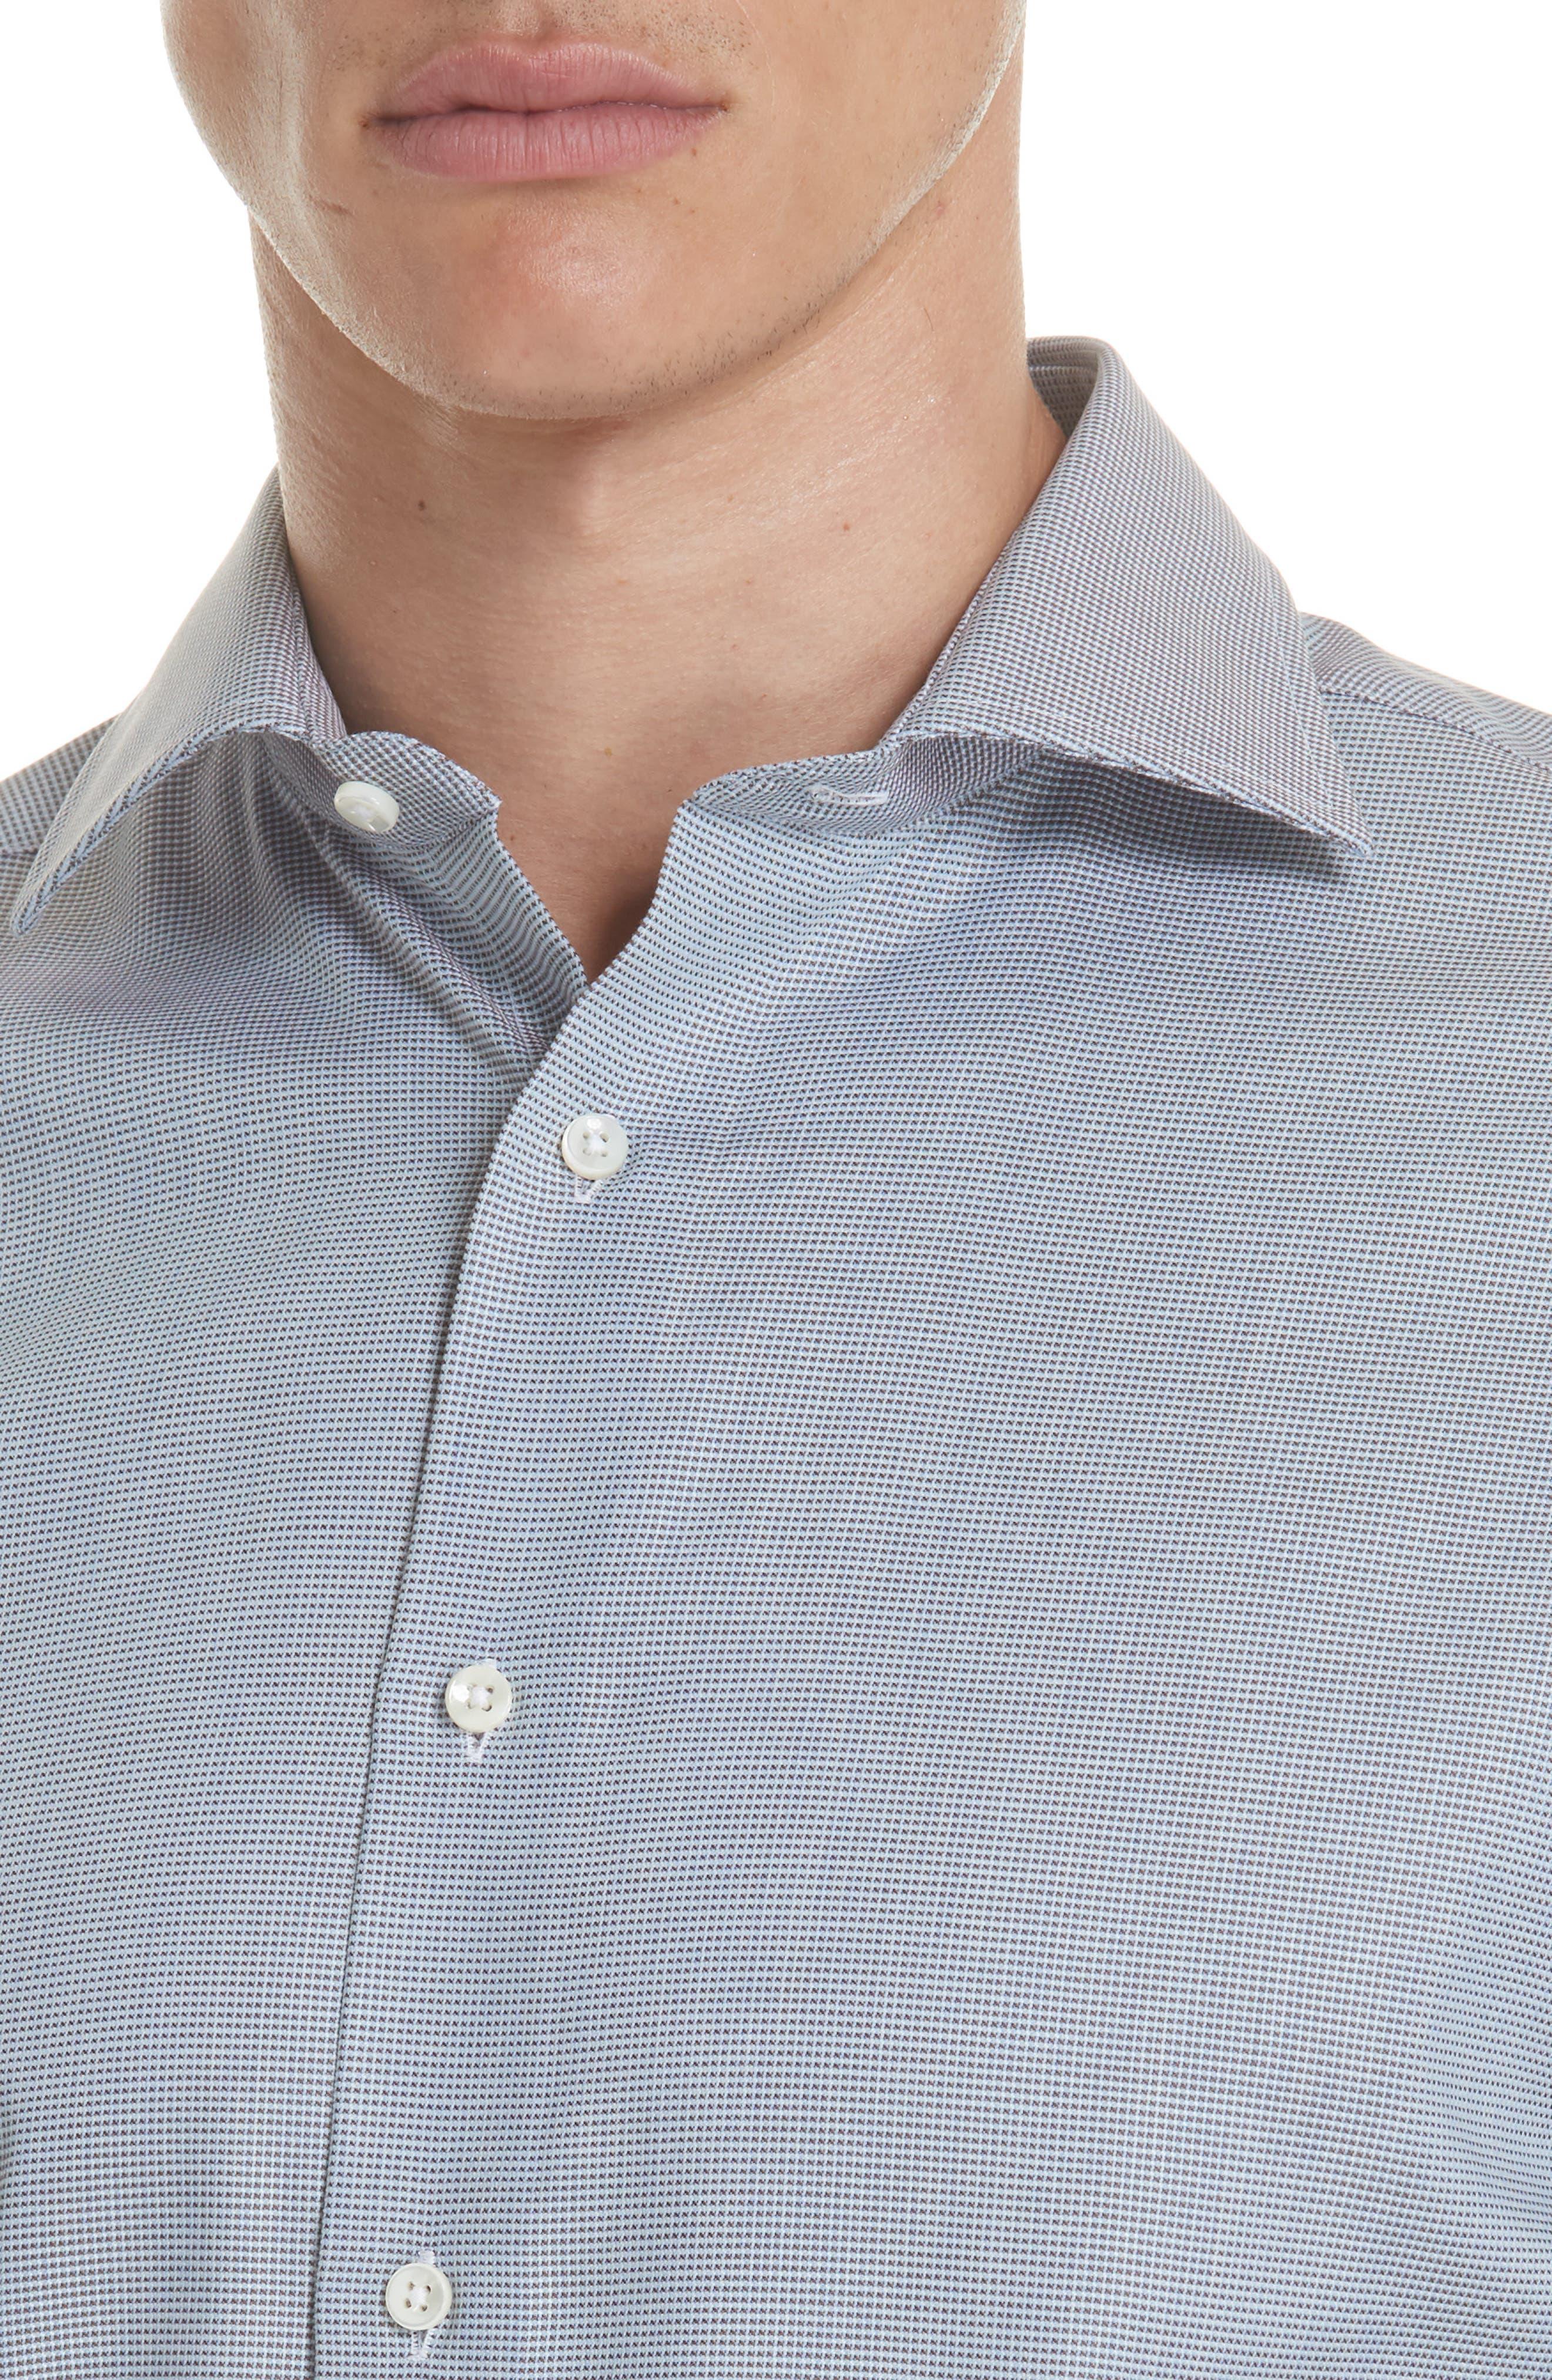 Regular Fit Solid Dress Shirt,                             Alternate thumbnail 2, color,                             Brown